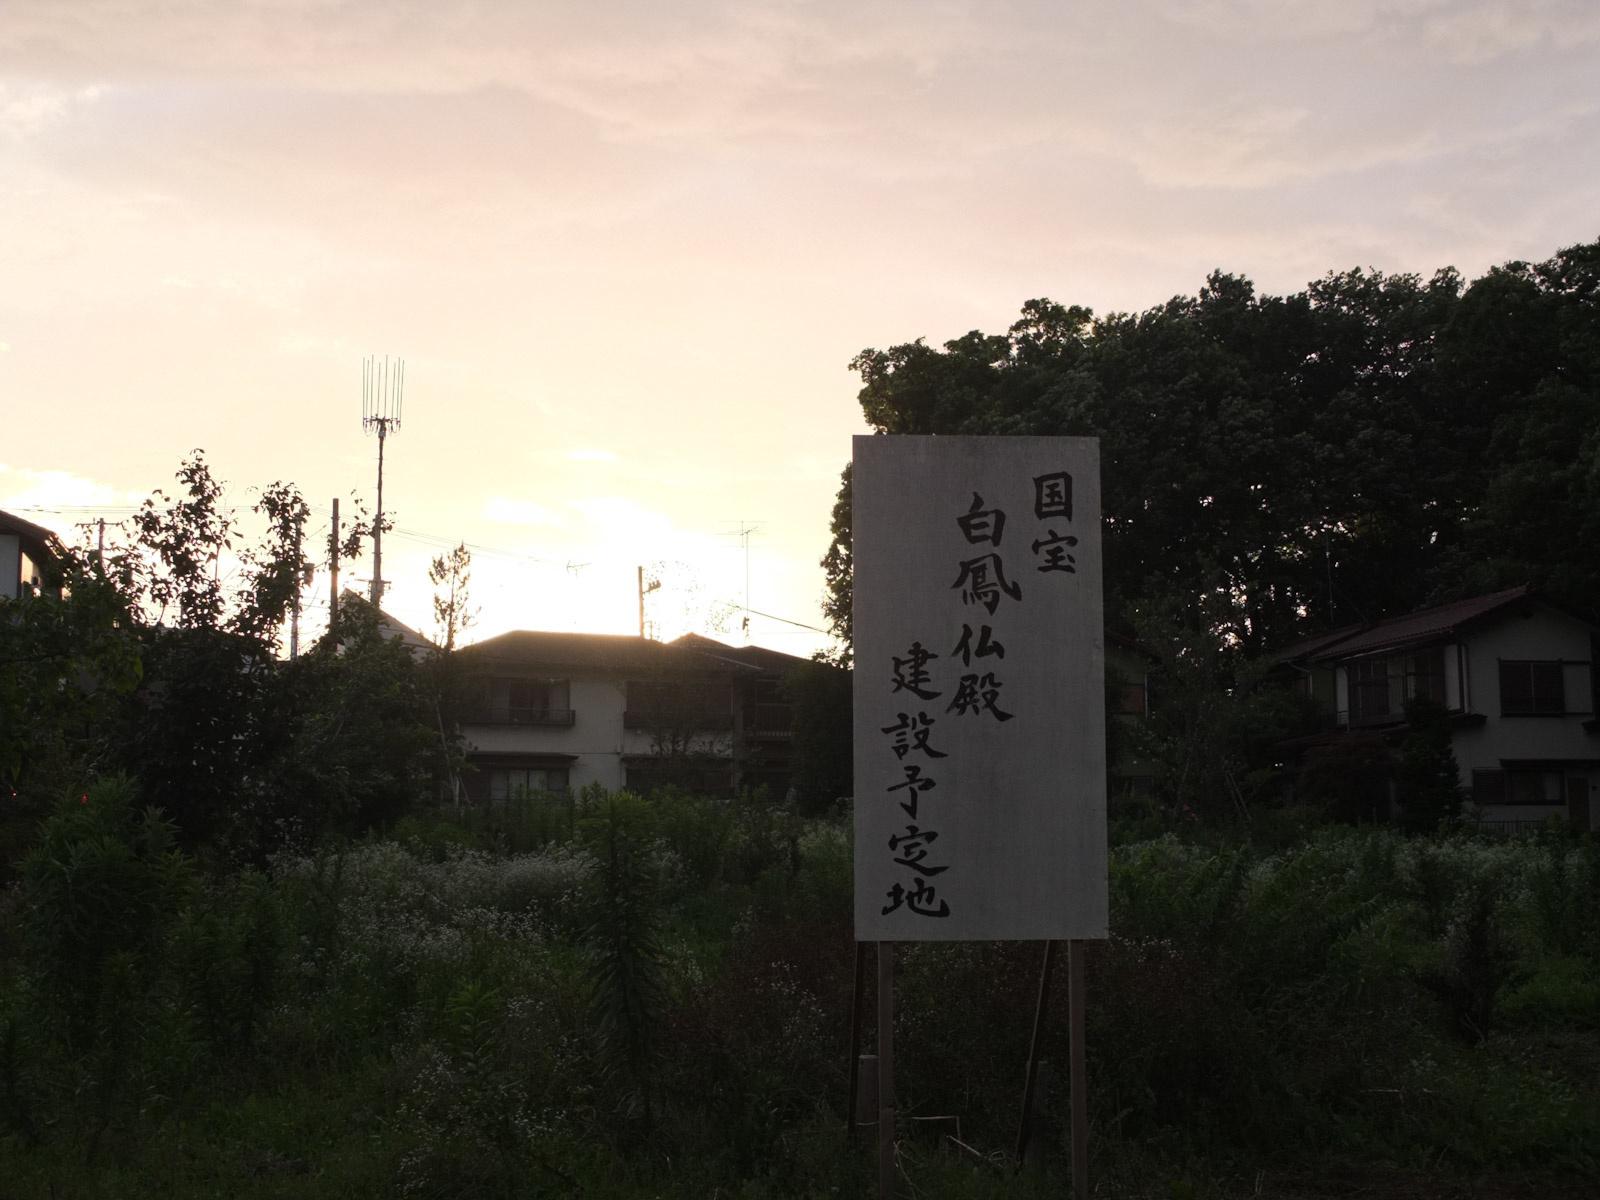 f:id:Yamadamado:20200706163918j:plain